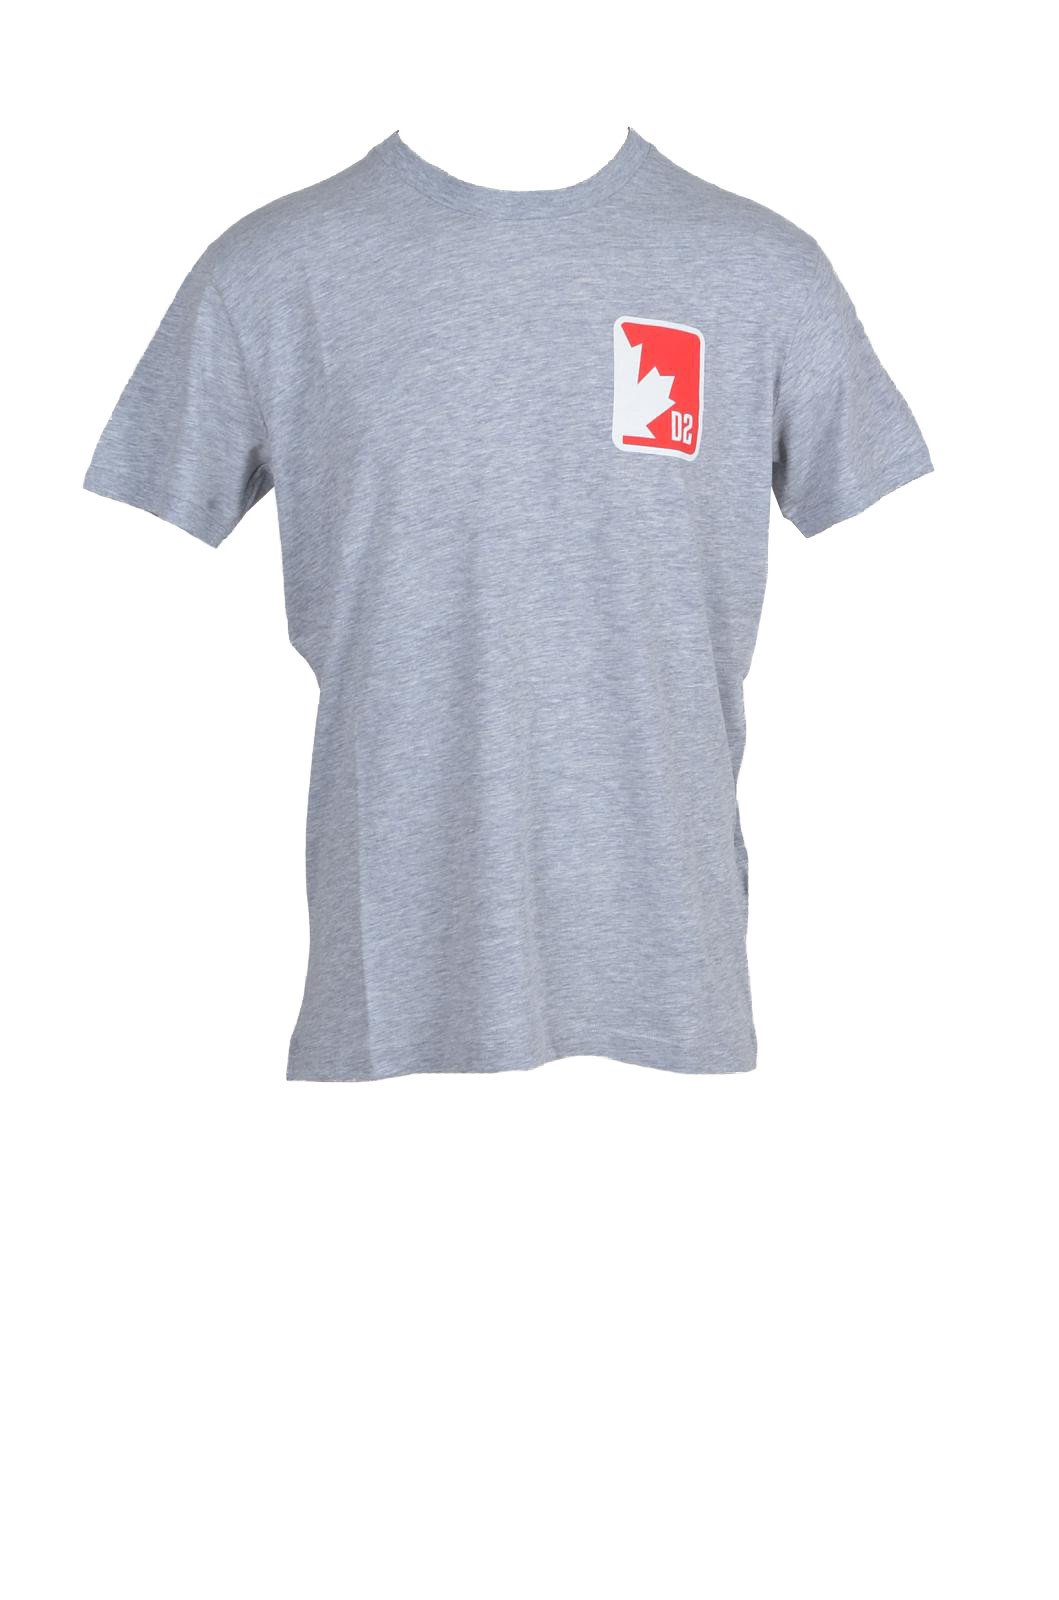 Vivienne Westwood - Vivienne Westwood Men T-Shirt - grey 3XL